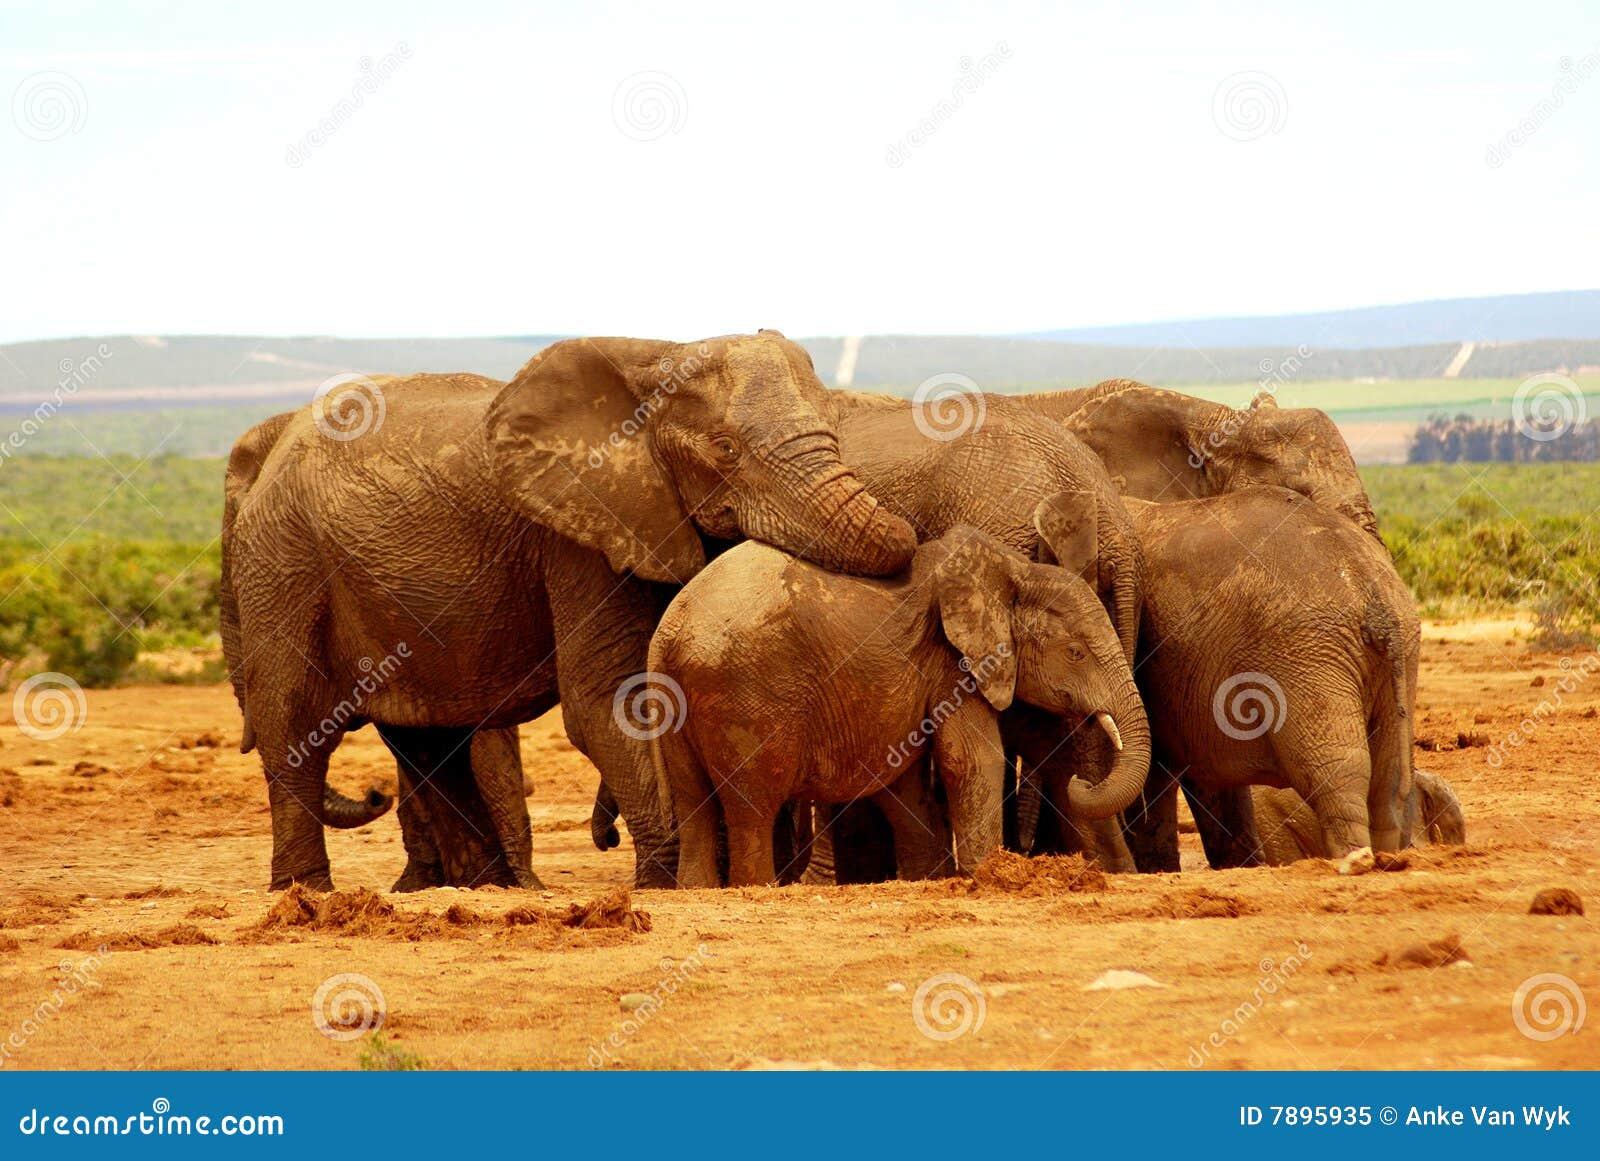 elephant group hug royalty free stock photo image 7895935. Black Bedroom Furniture Sets. Home Design Ideas